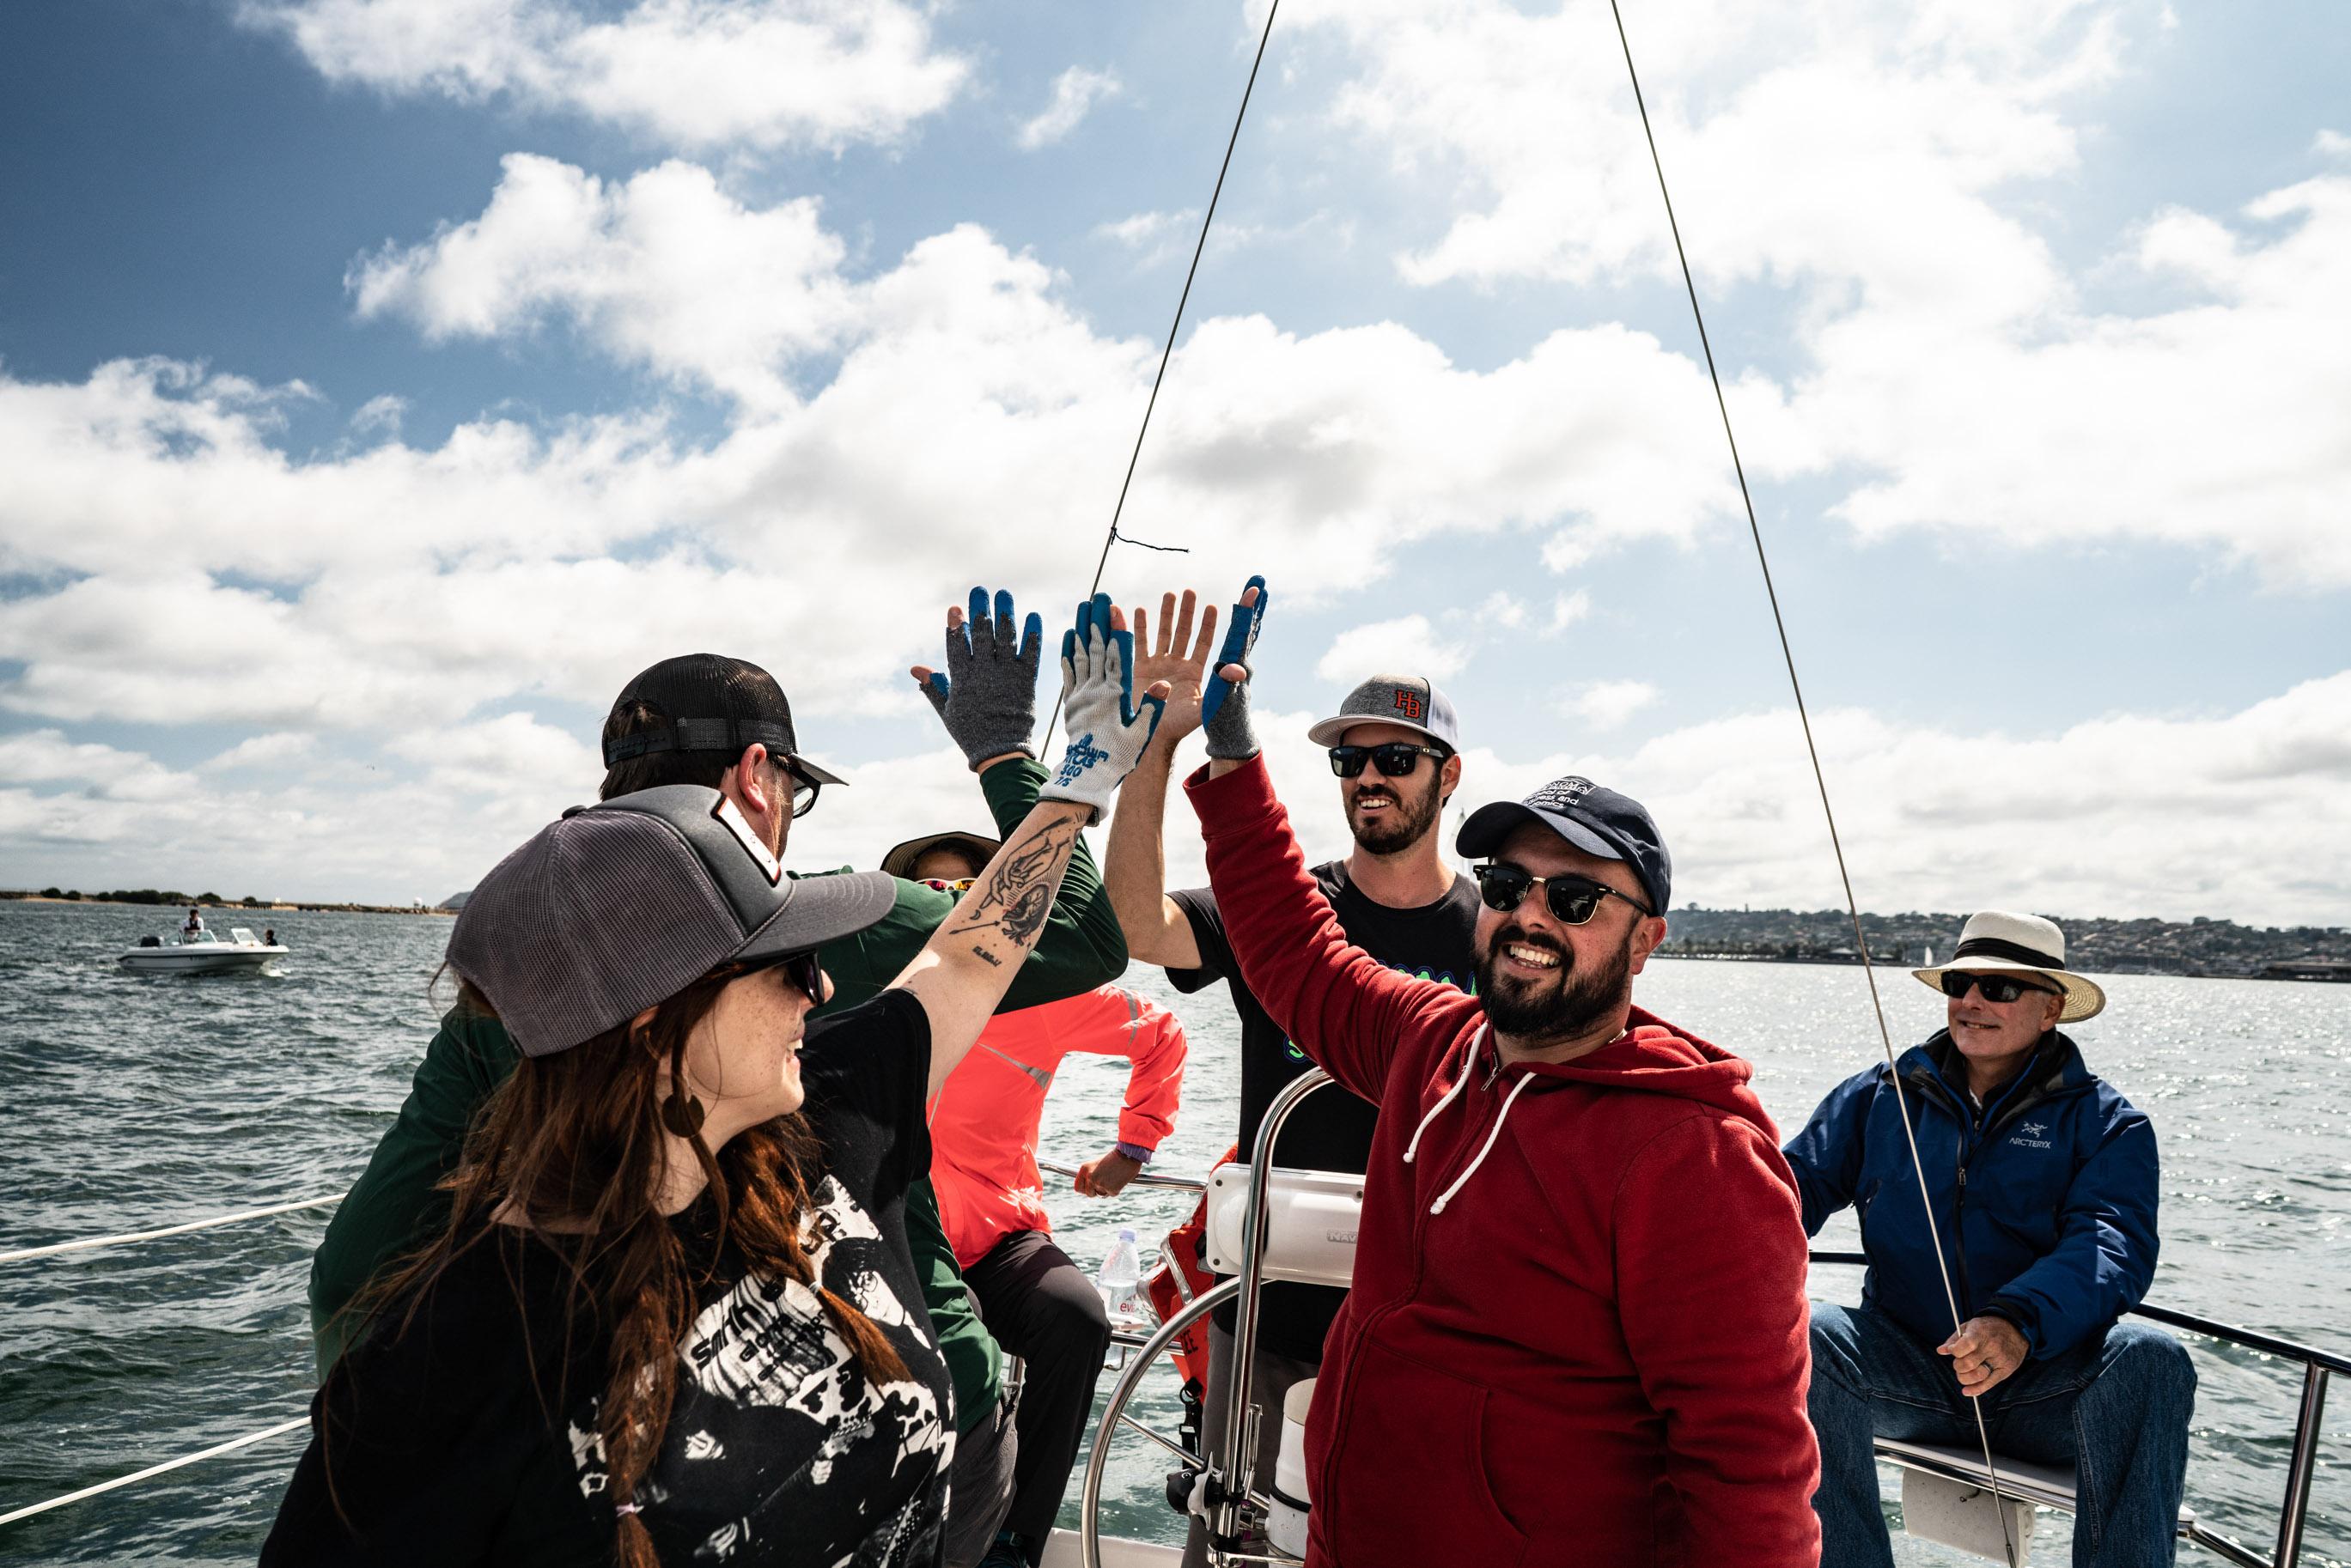 Passengers on a sailboat